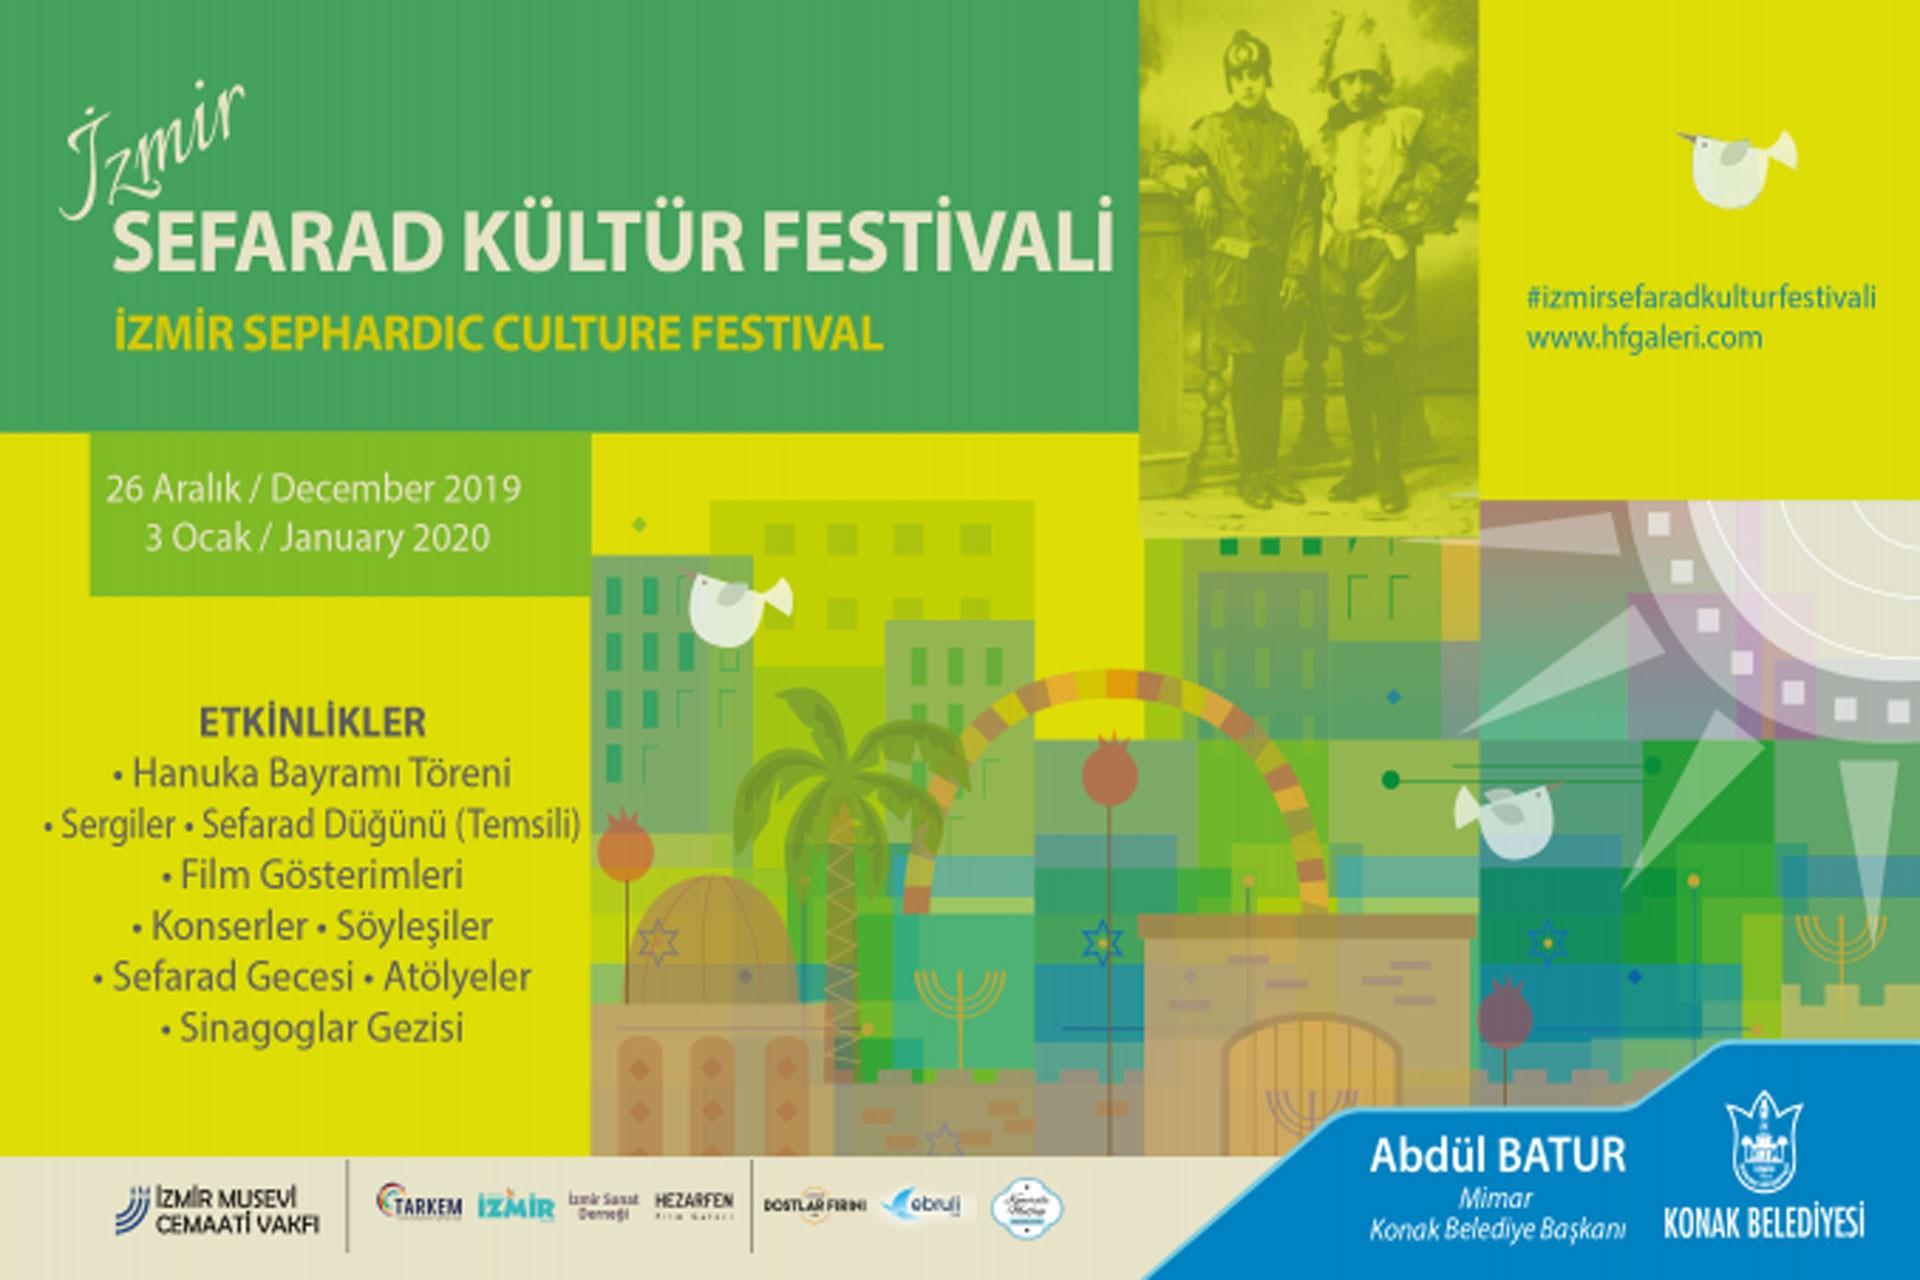 Sefarad Kültür festivalinin görseli